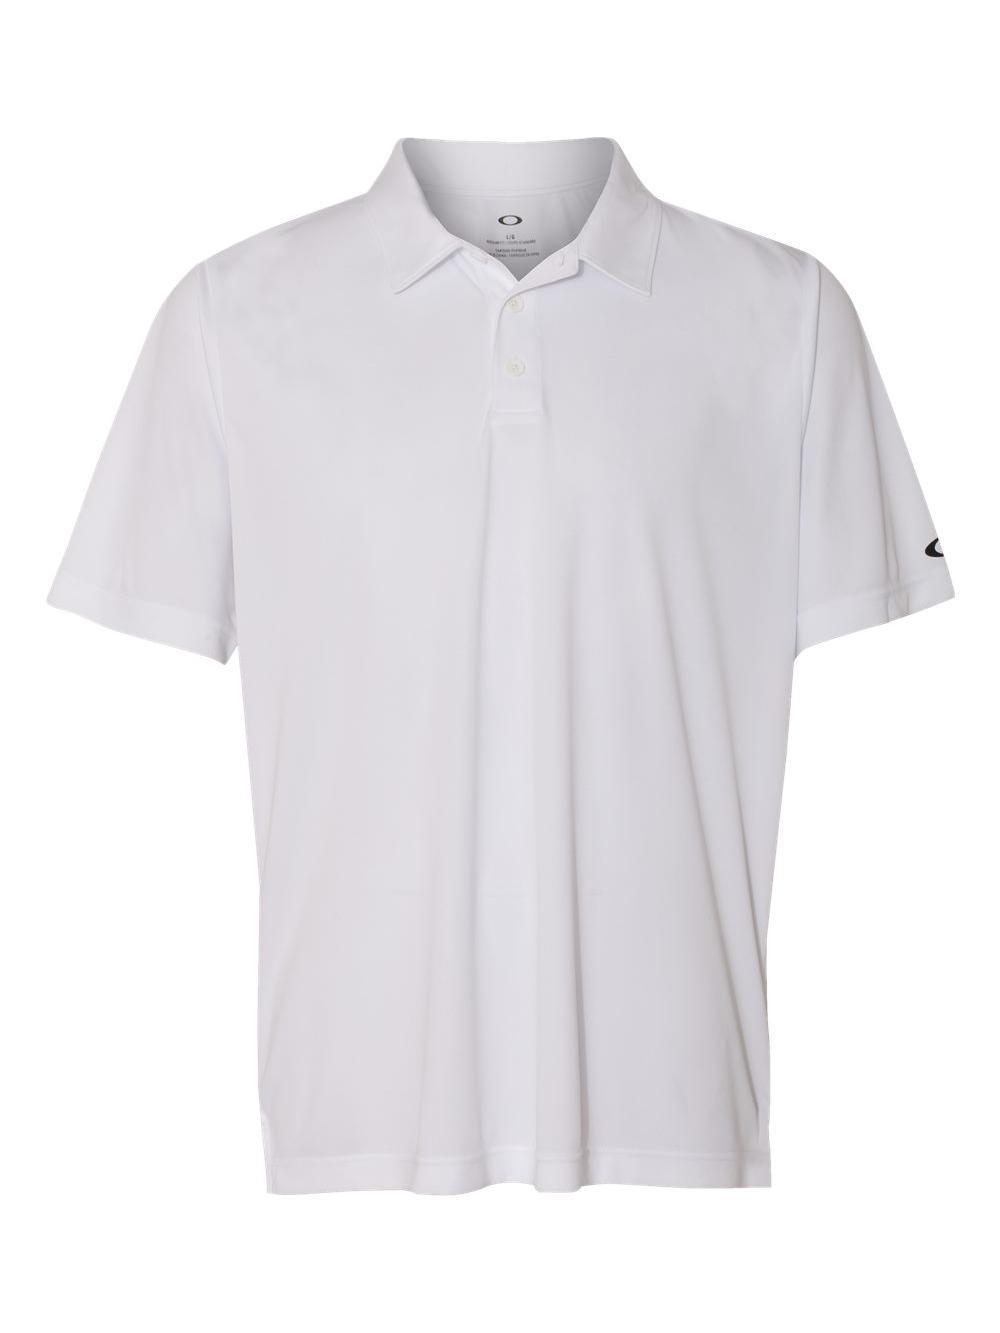 Oakley-Performance-Sport-Shirt-433979ODM thumbnail 18